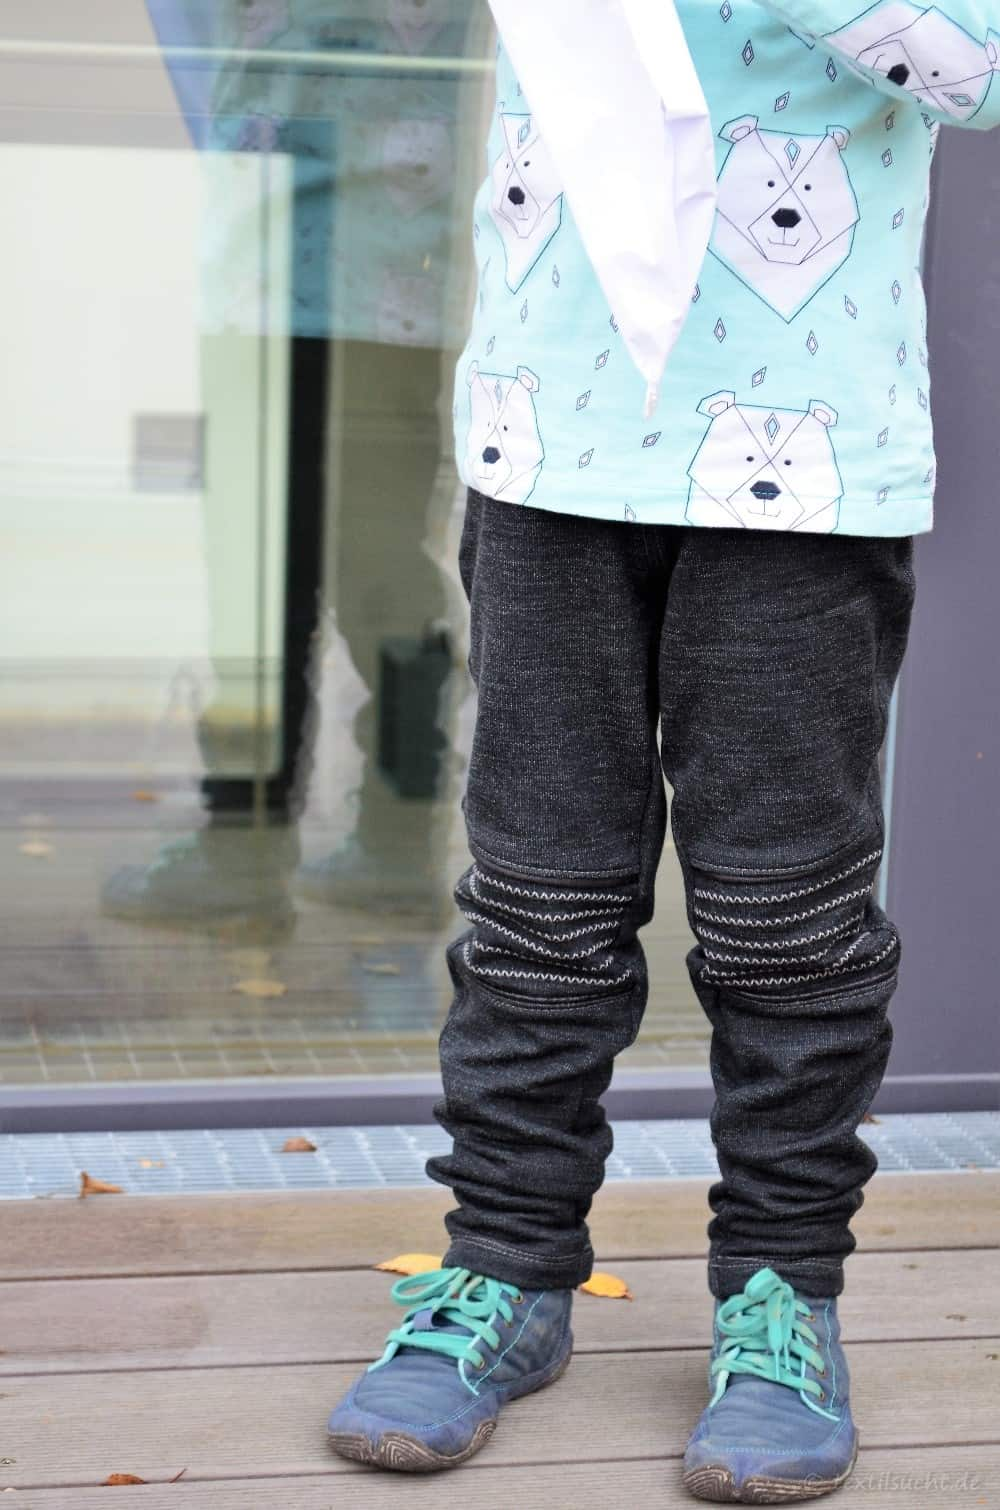 Schnittmuster Kinderhose Steppo aus Wollsweat - Bild 10 | textilsucht.de